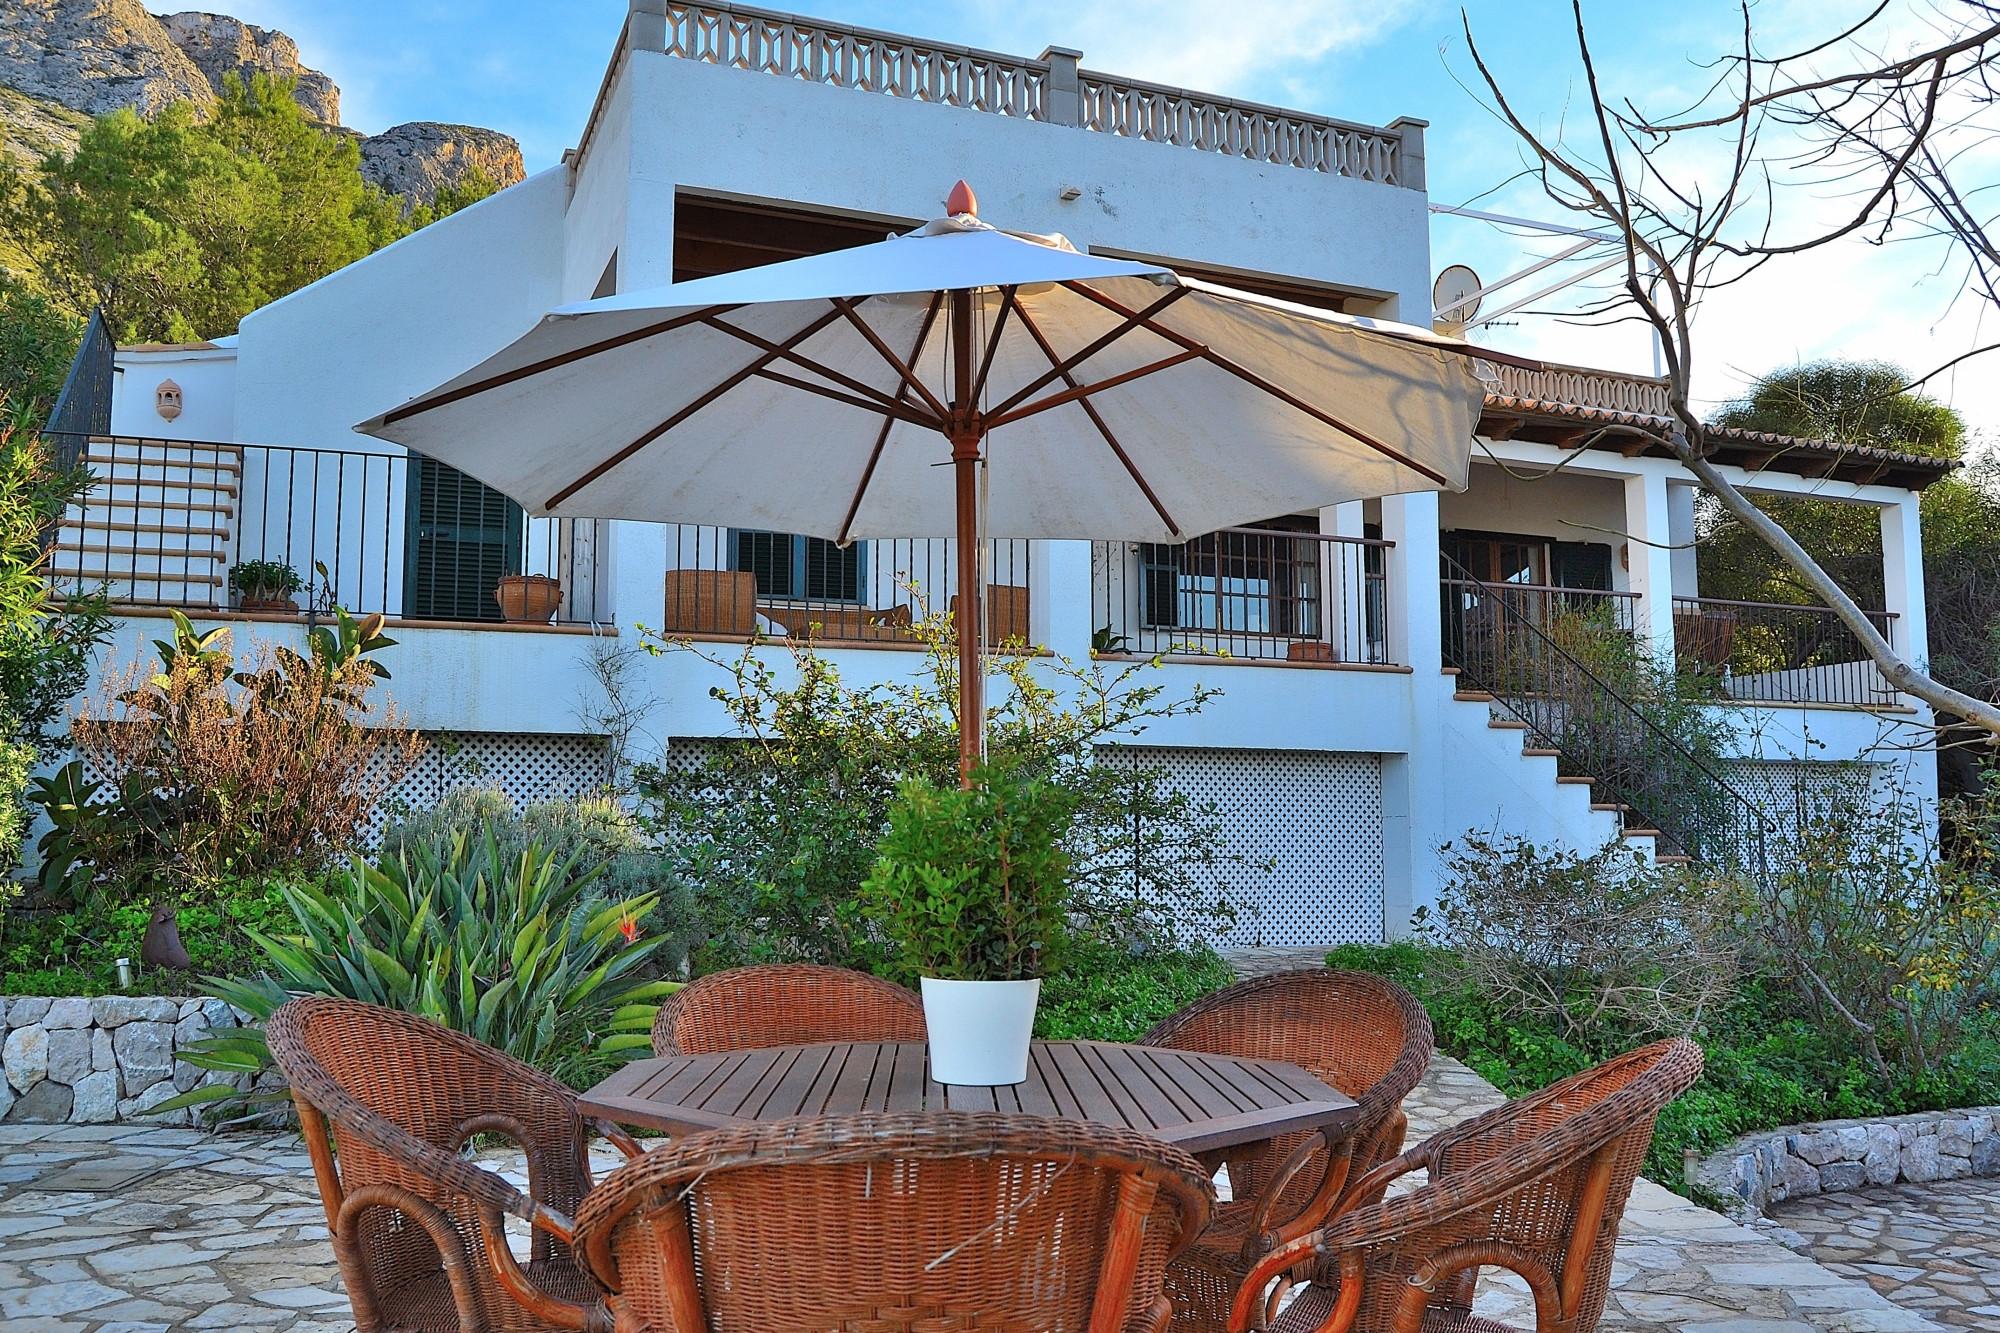 Casa de vacaciones para alquilar en betlem mallorca - Casas para alquilar en mallorca ...